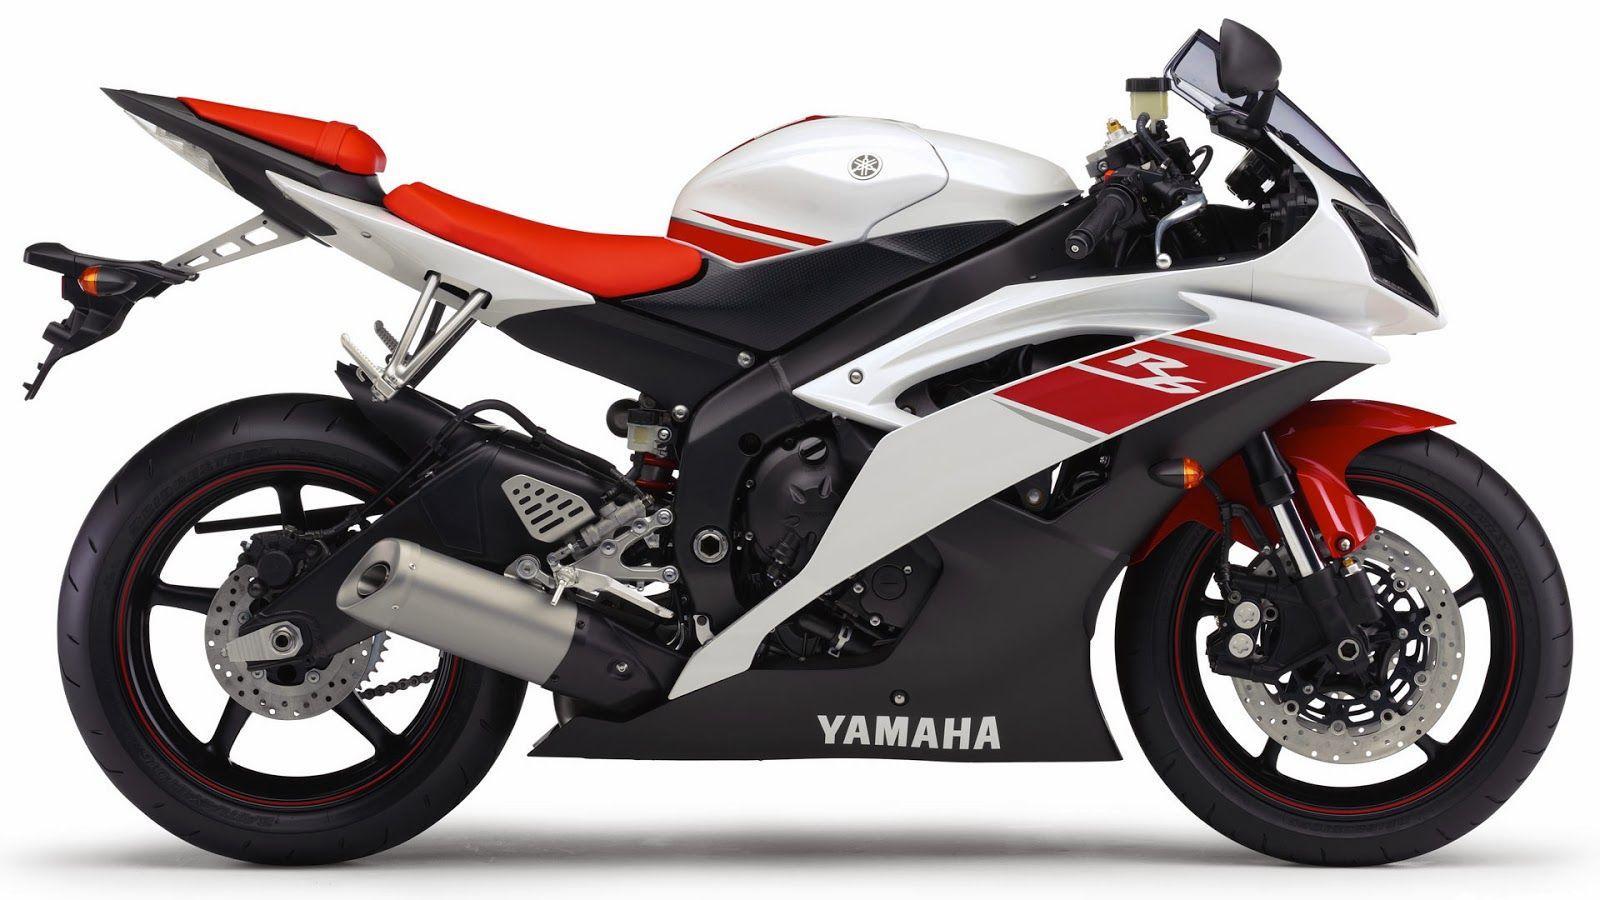 R15 Yamaha Wallpaper Yamaha R15 V3 Wallpape...